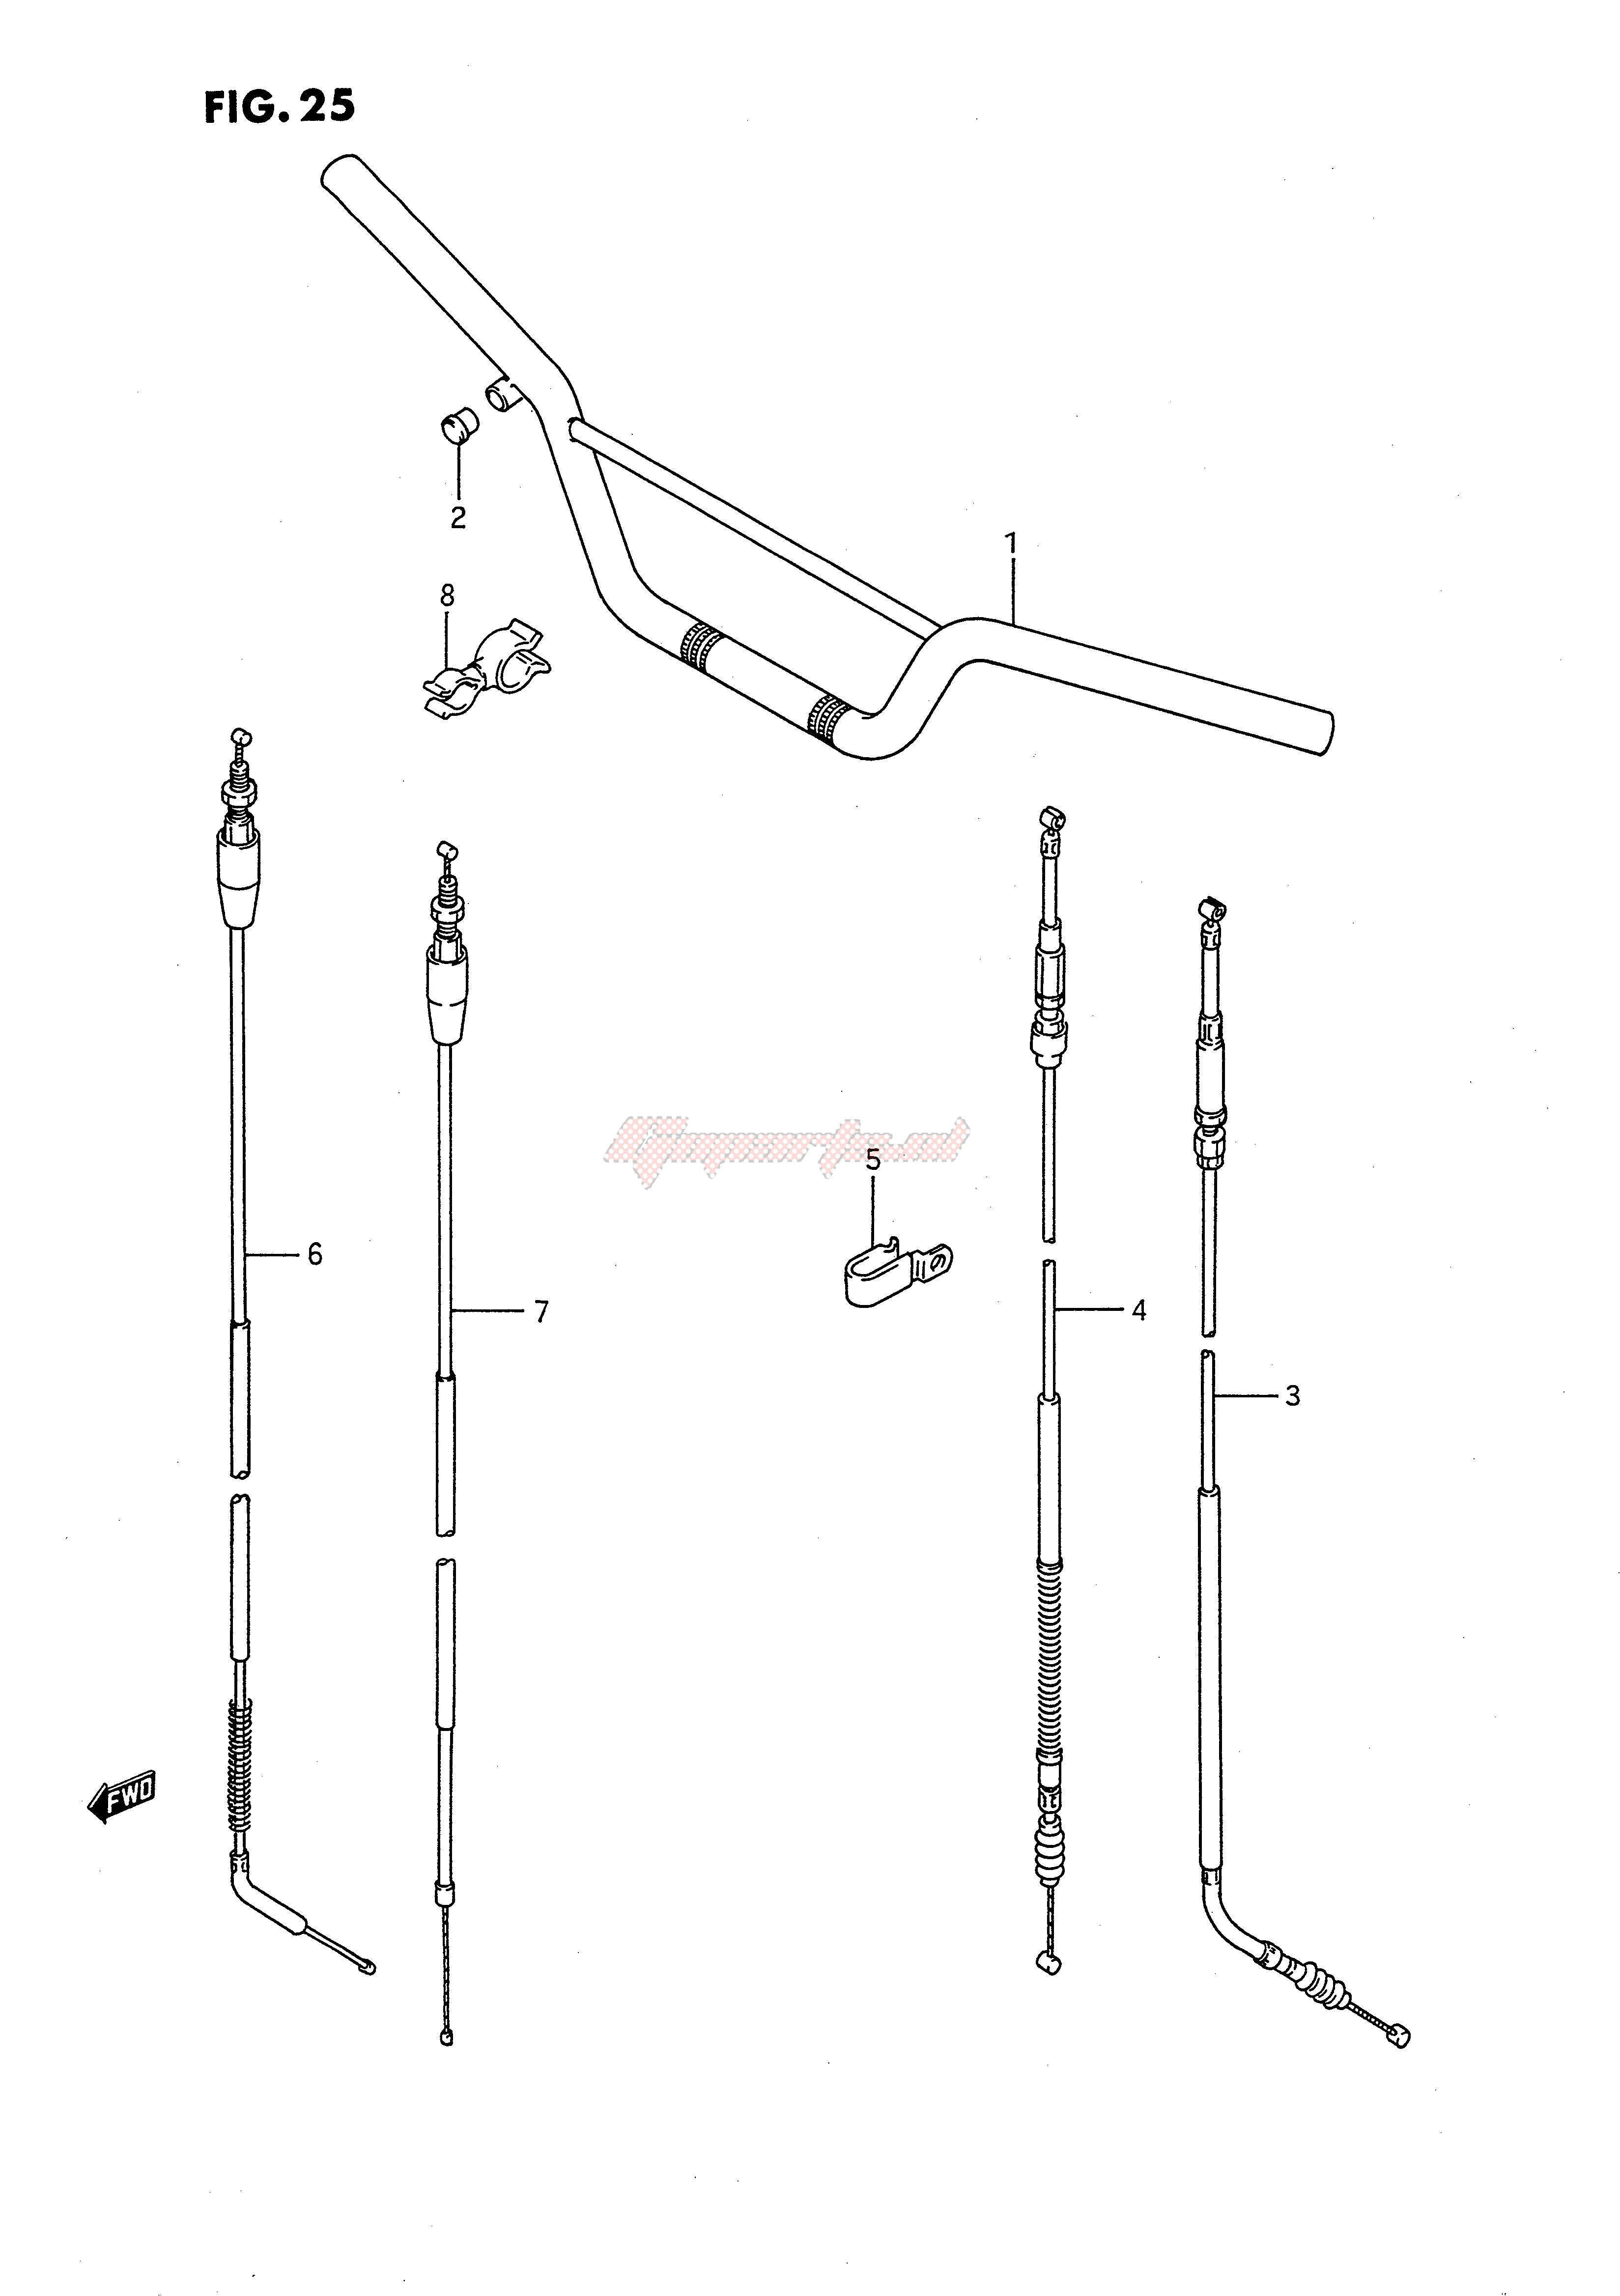 Suzuki Cable Clutch 58200-02B13 New Oem Automotive Parts pubfactor.ma